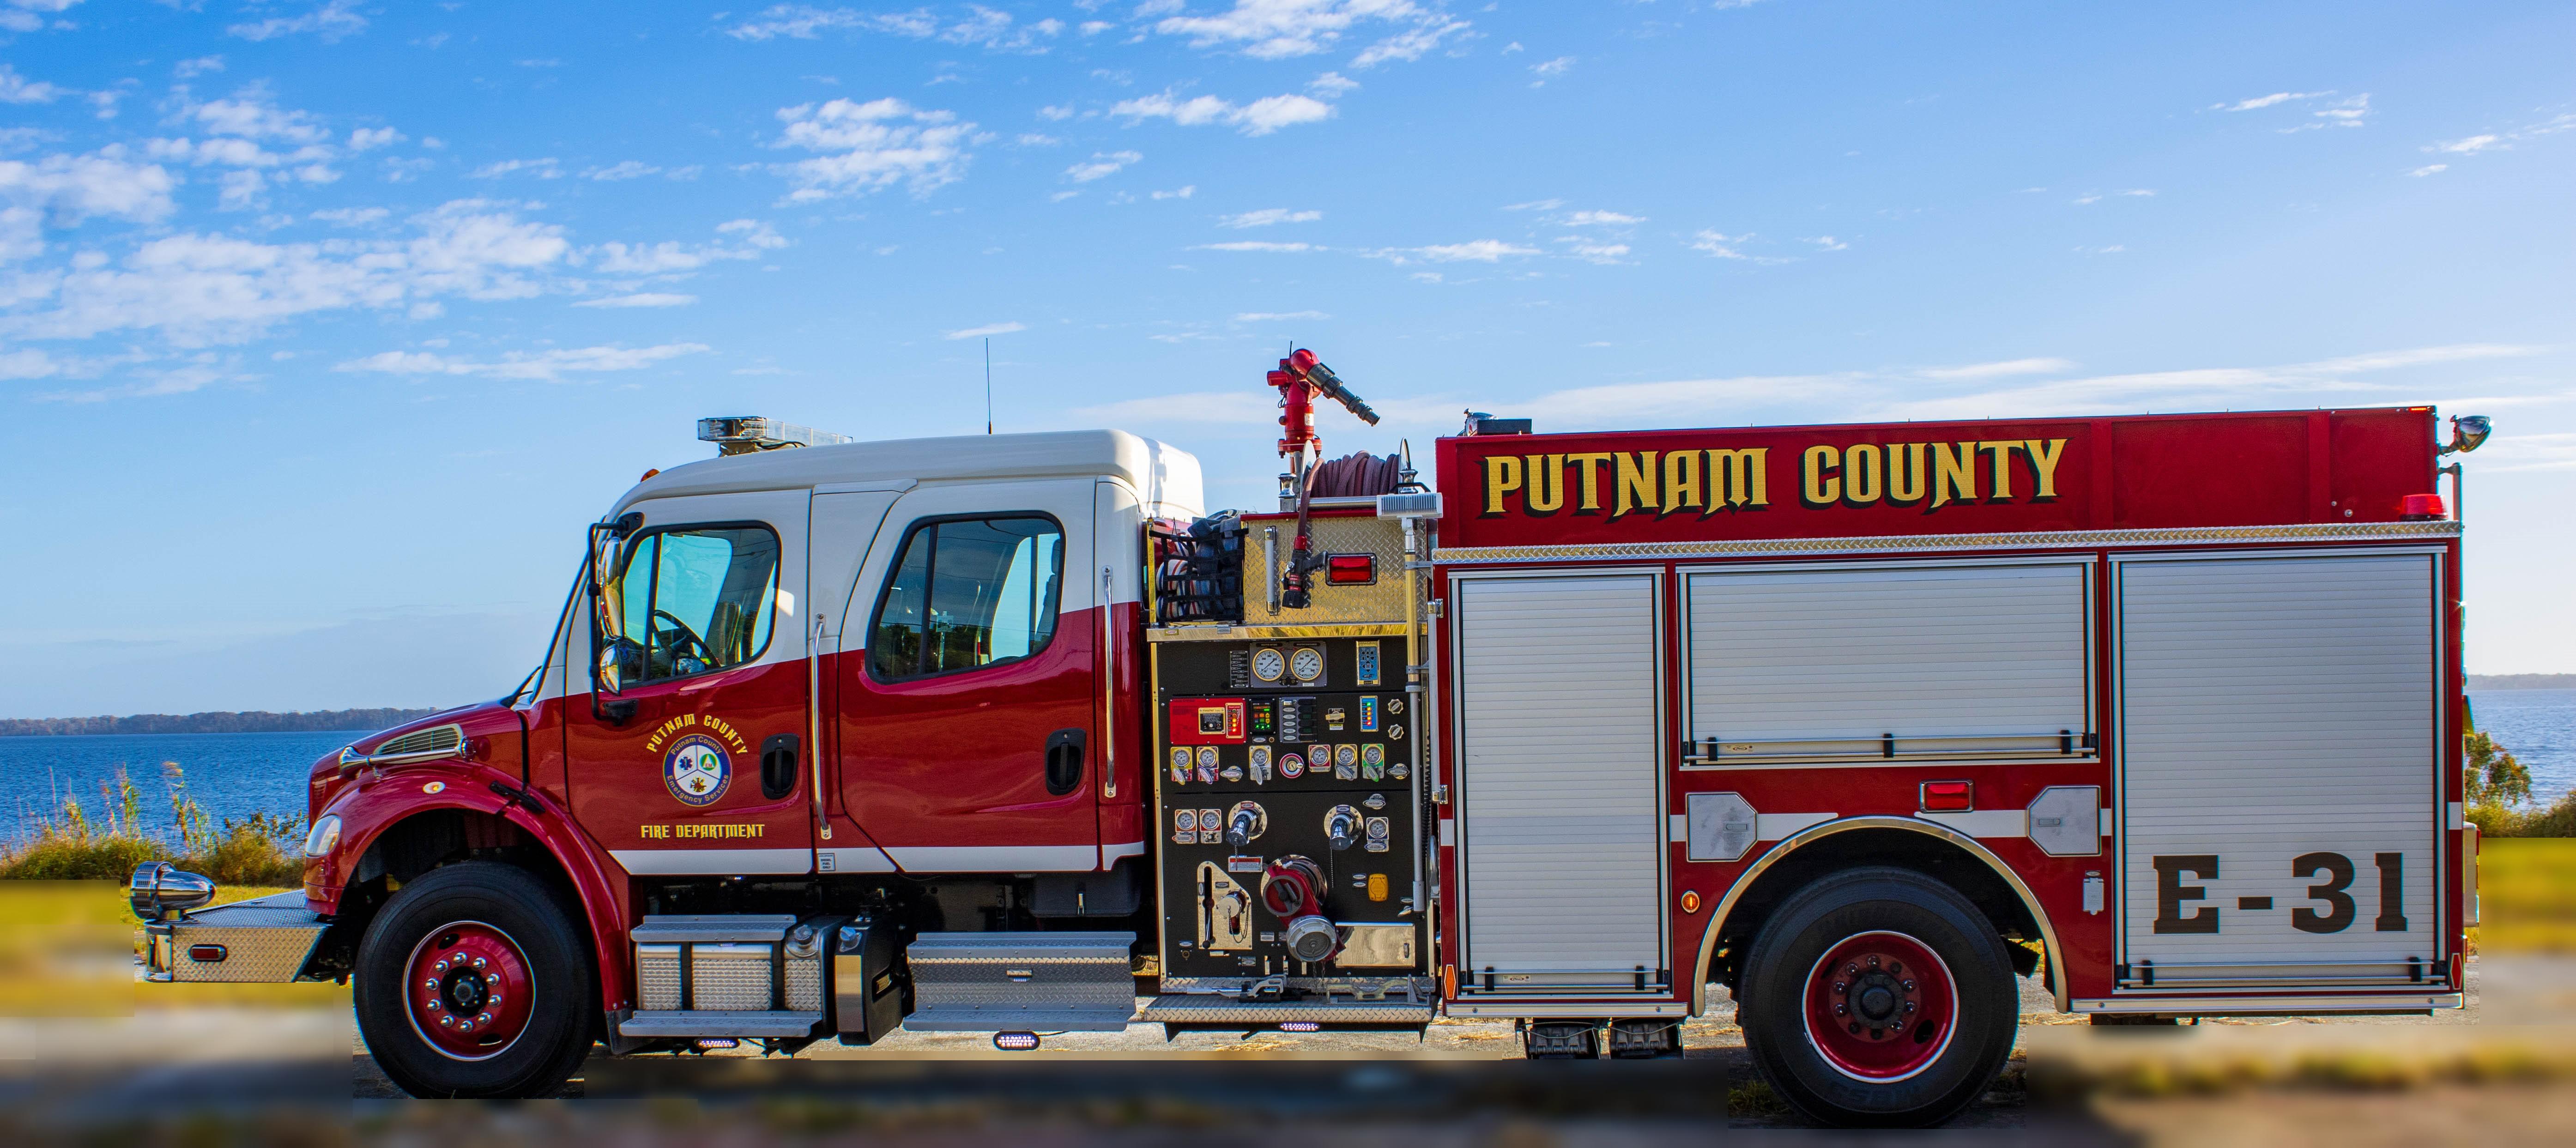 Putnam County Fire Engine E-31